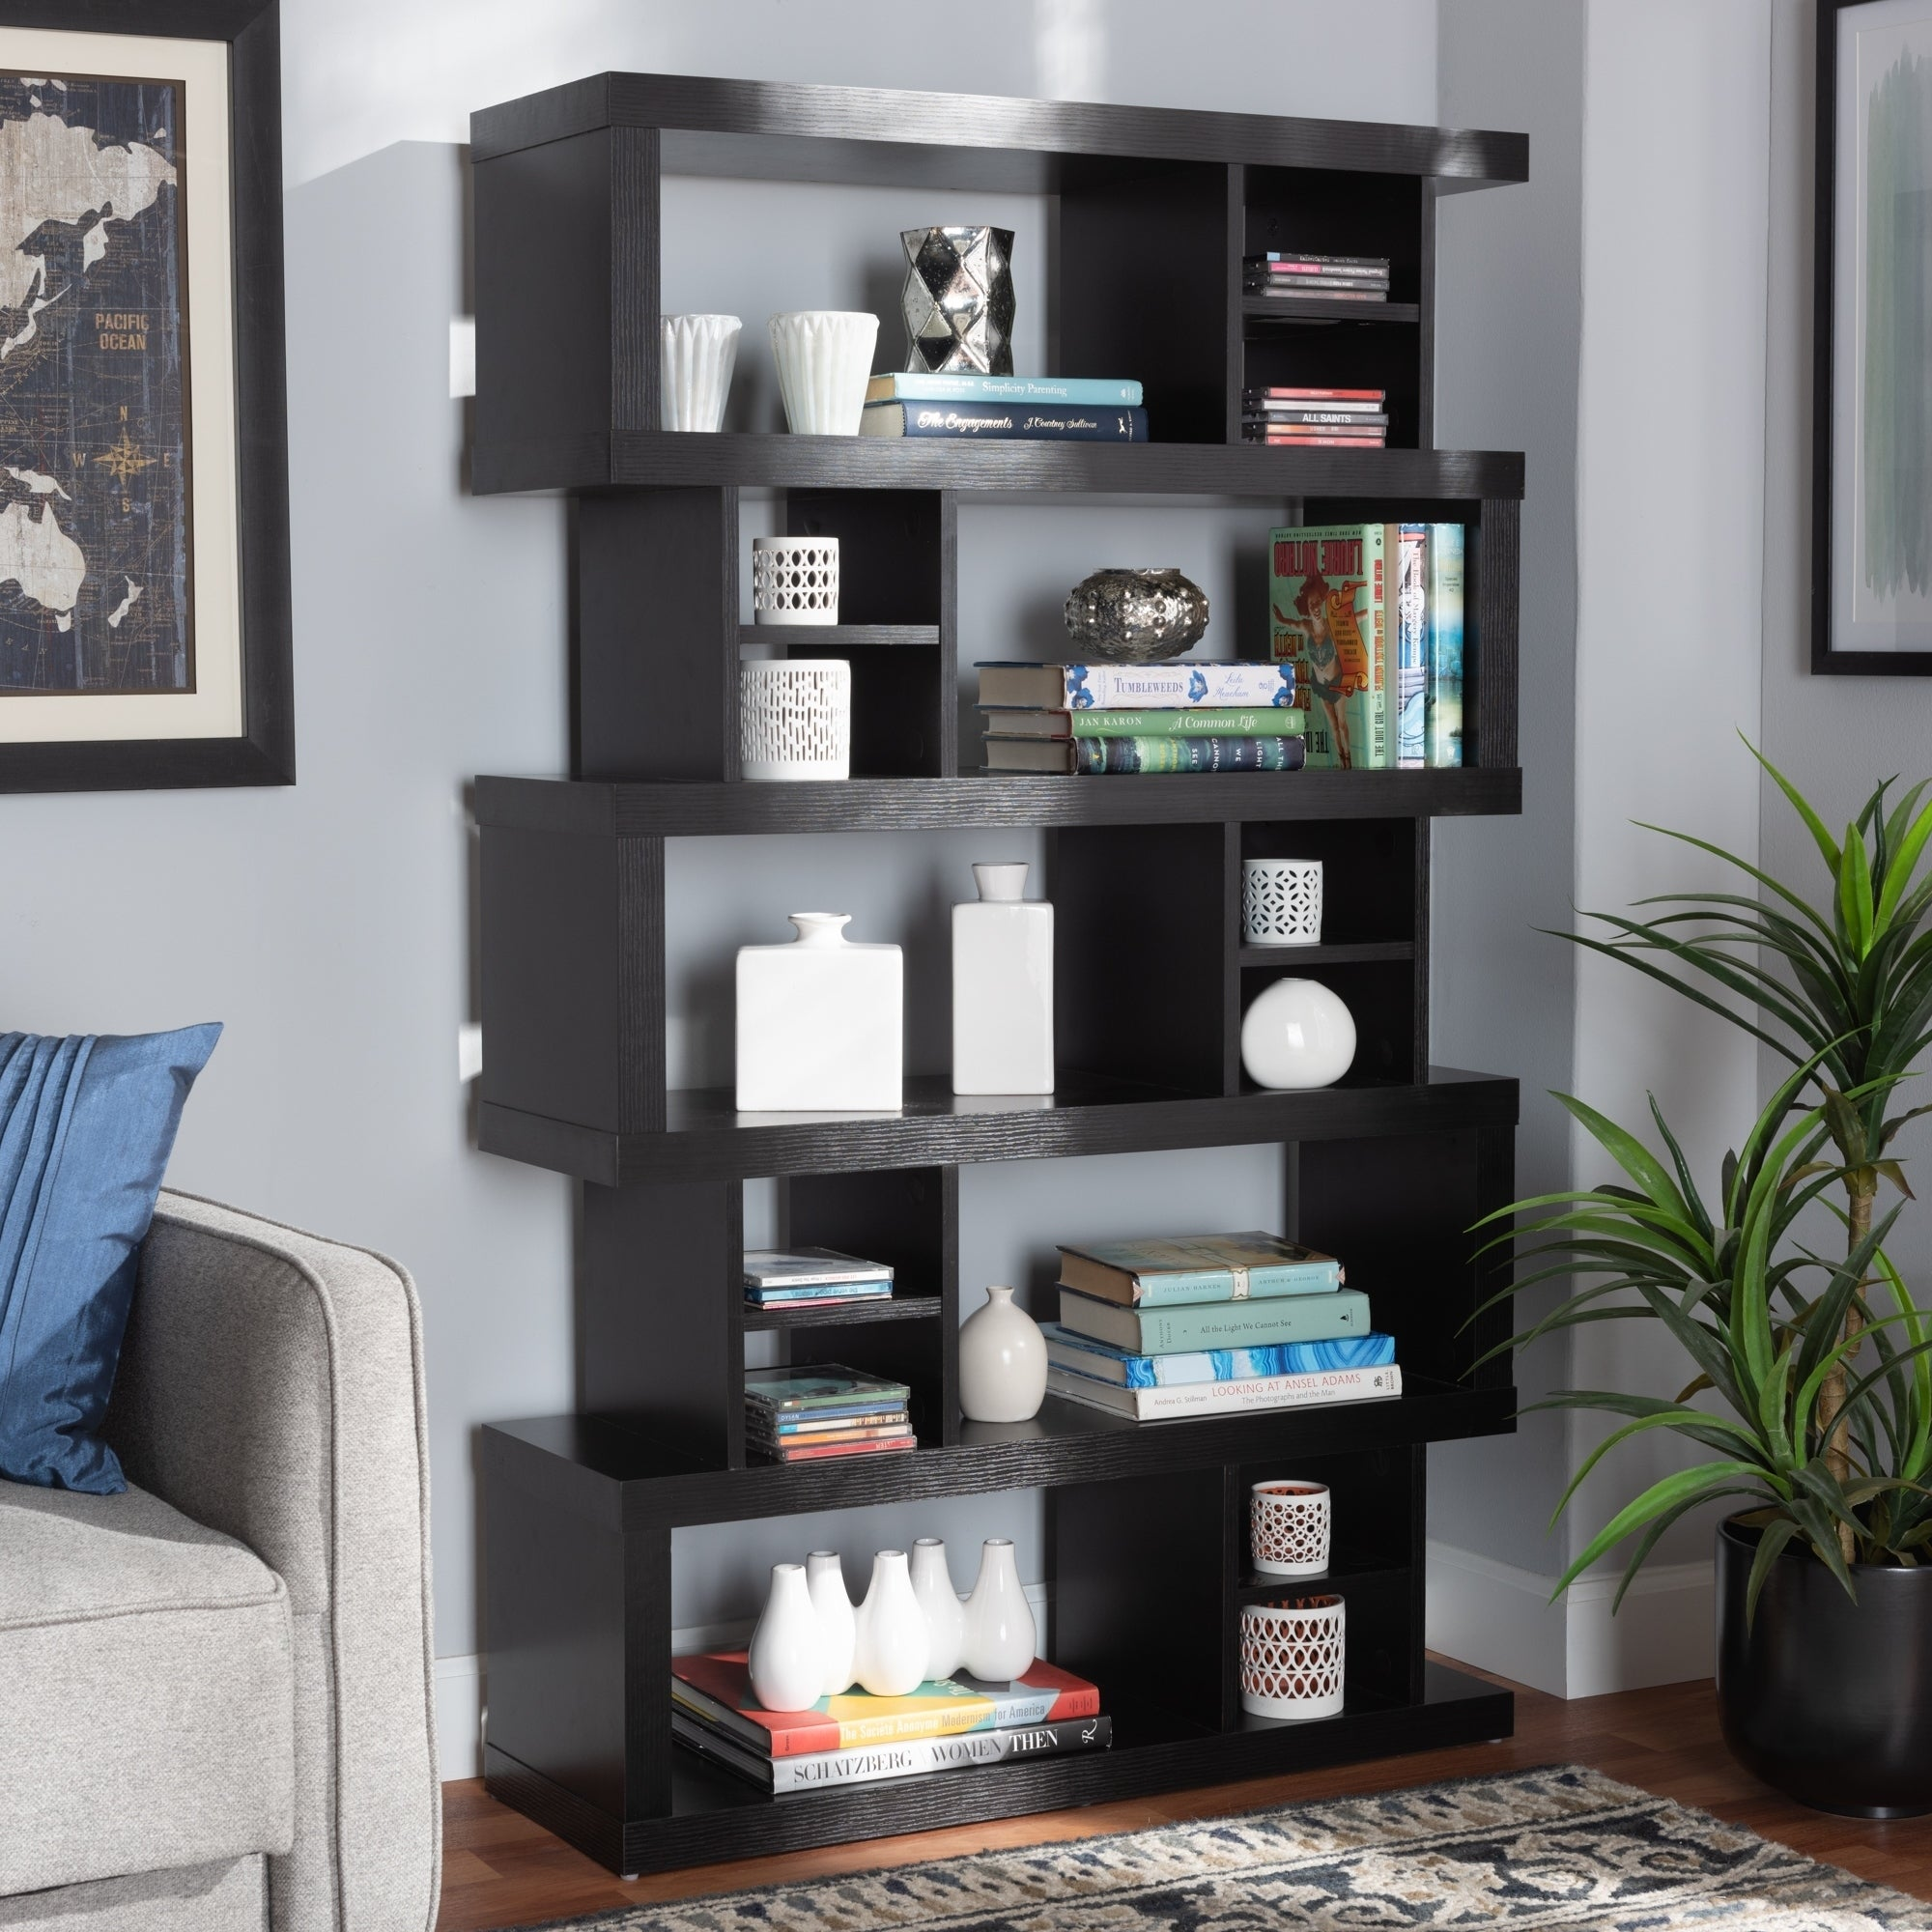 Shop Dora Modern And Contemporary 5 Tier Geometric Bookshelf On